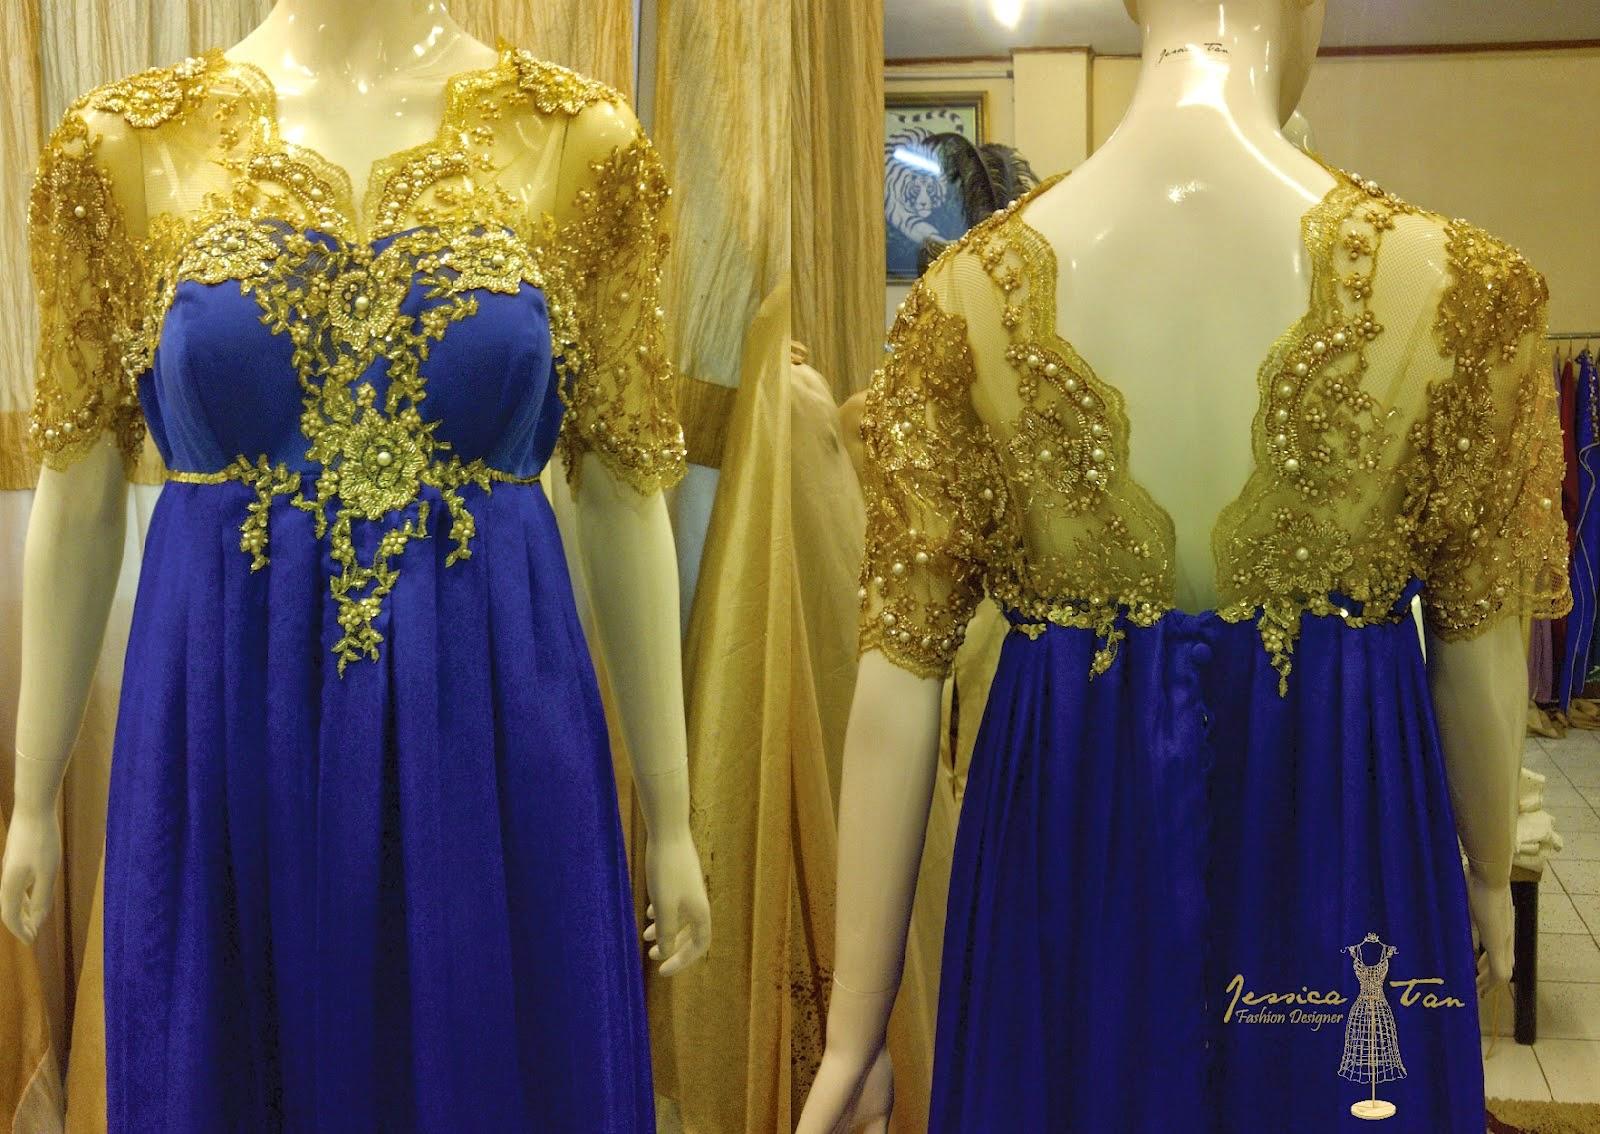 Kumpulan Foto Model Baju Kebaya Untuk Ibu Hamil Kebaya Model Baru